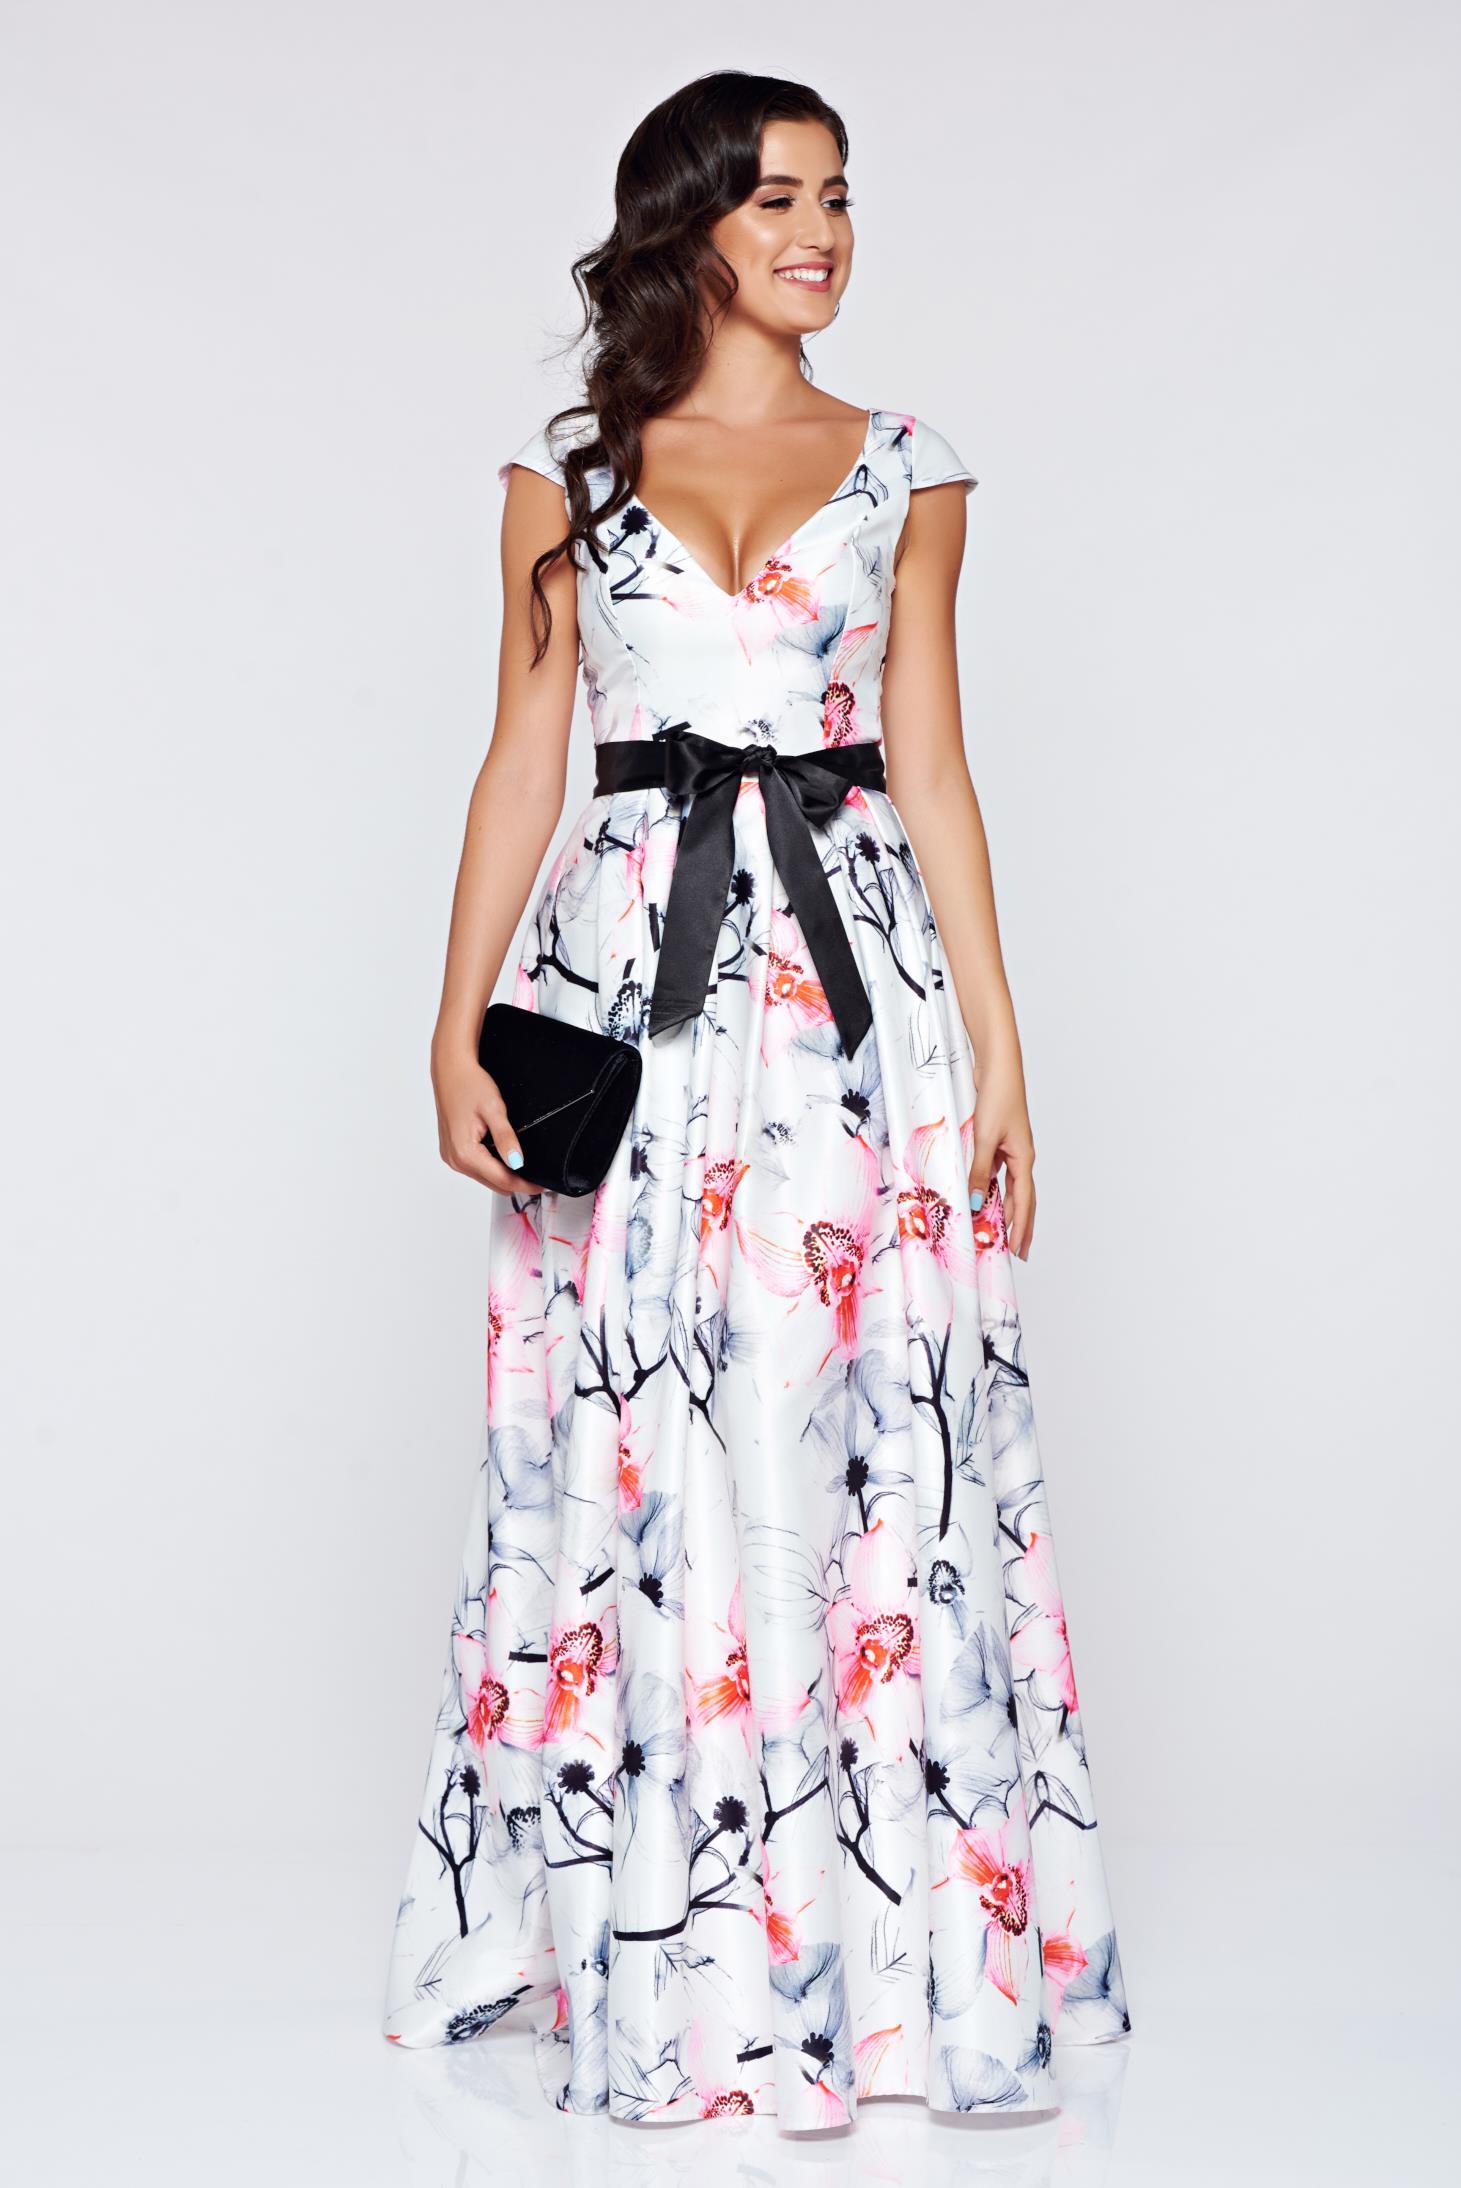 artista-white-elegant-dress-with-a-cleavage-push-u-S028868-1-305746.jpg 55b19d39baff0